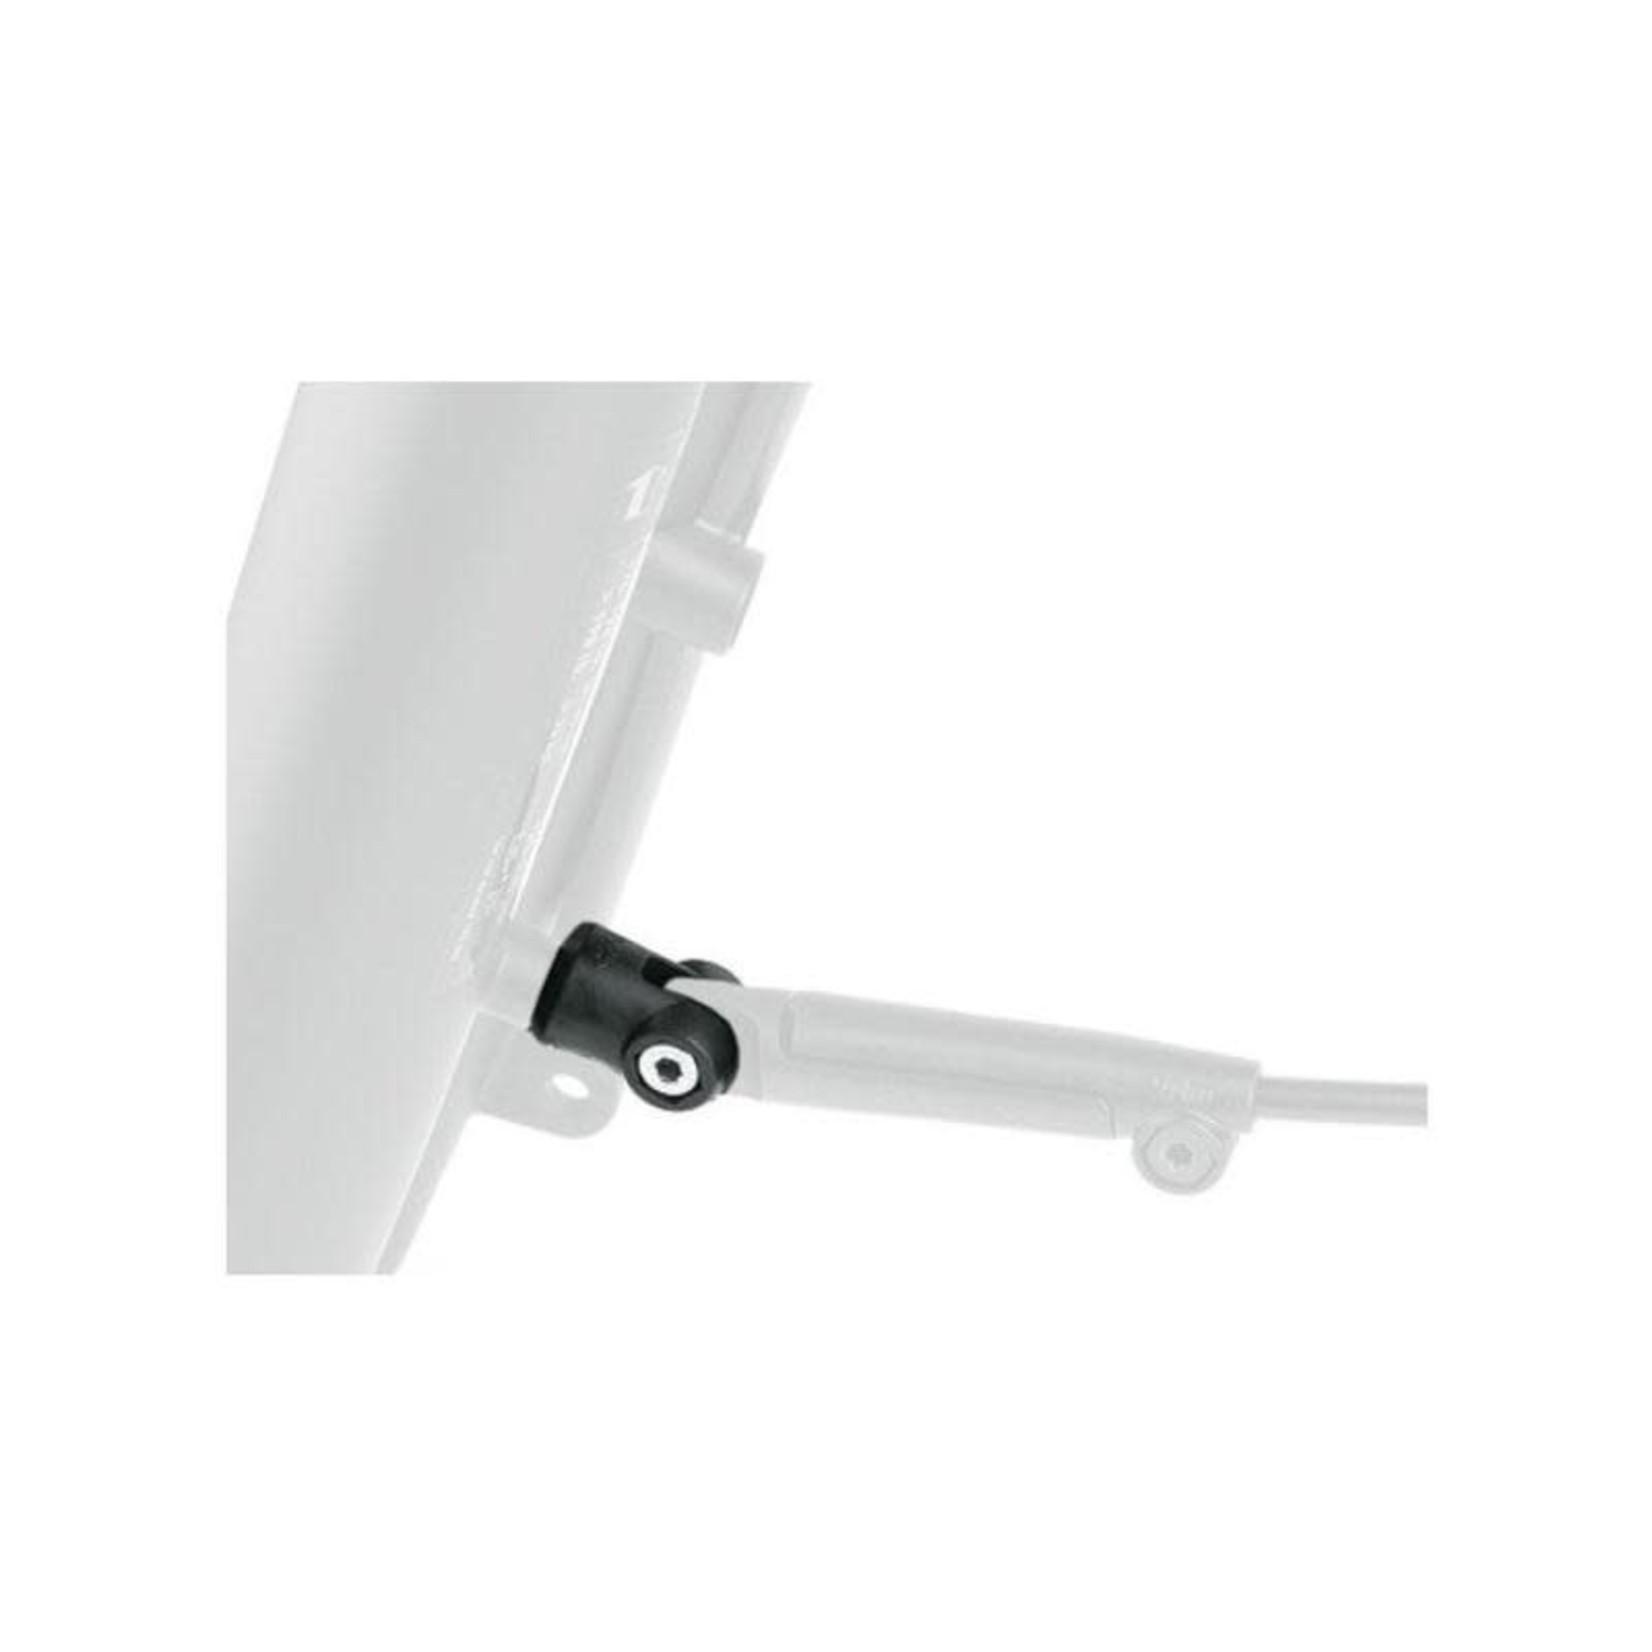 SKS SKS Suspension Adapter (Suntour/RockShox)